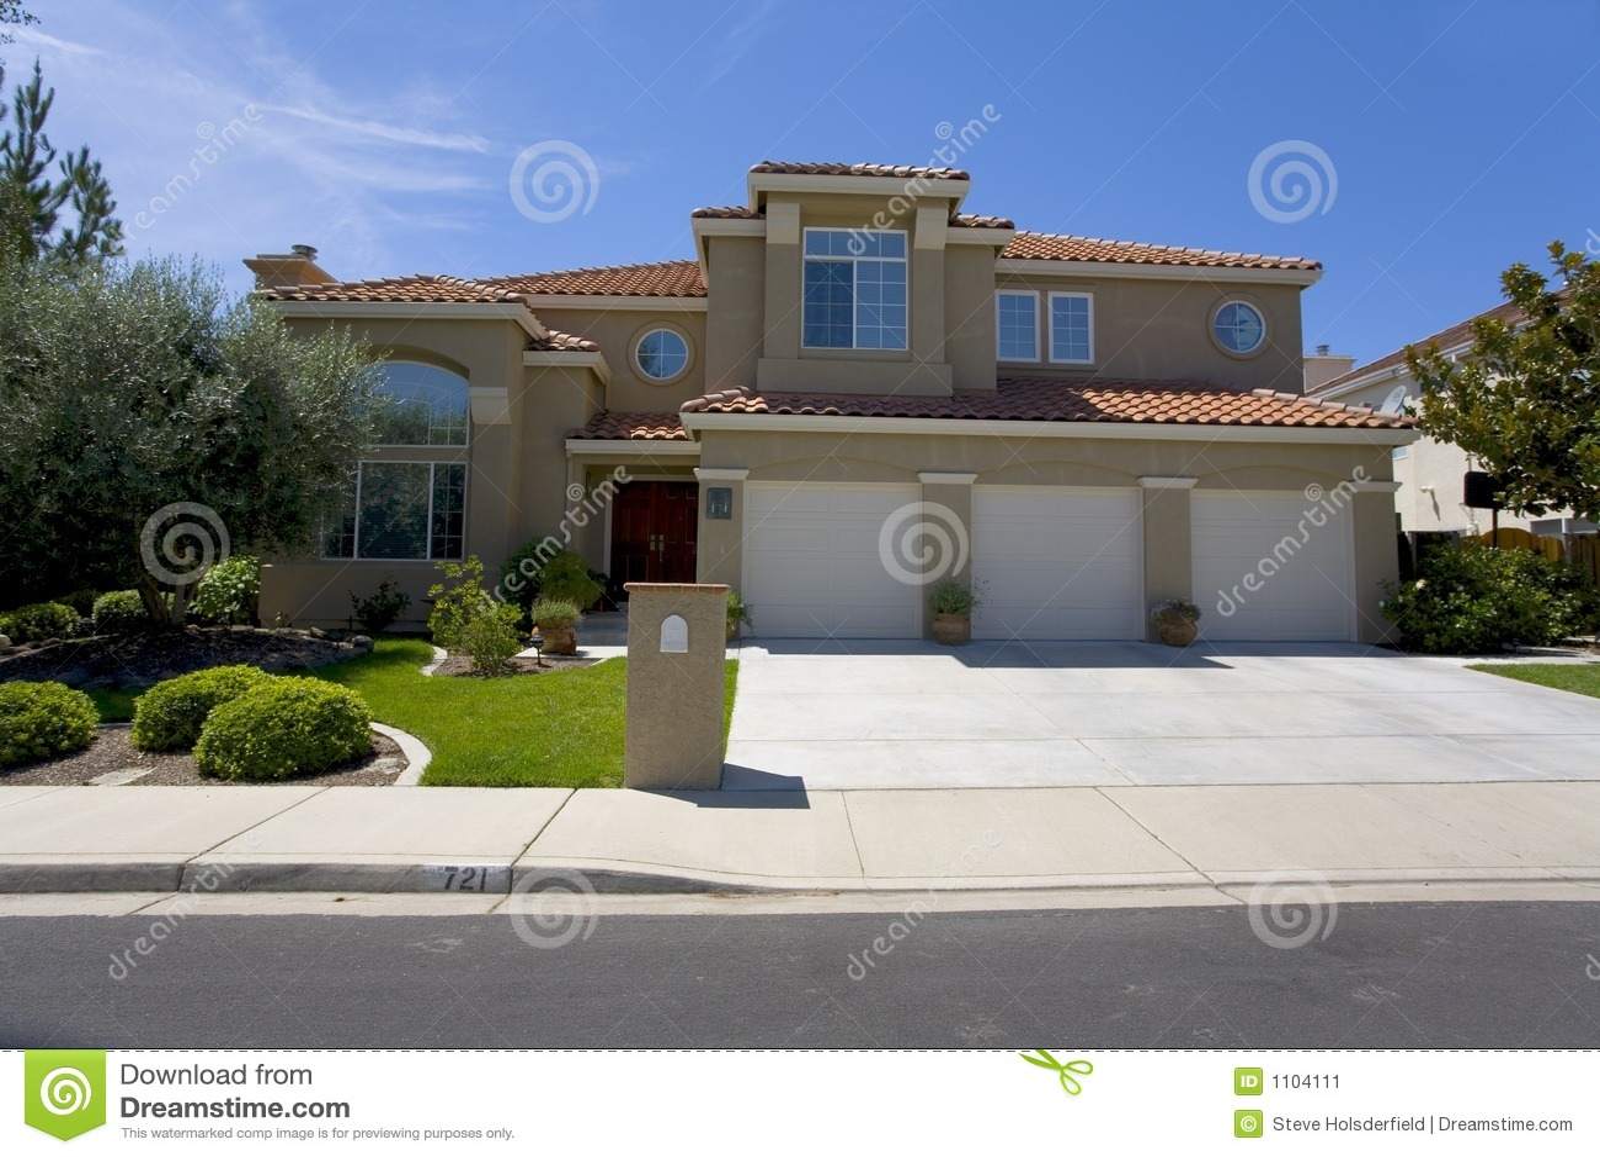 grande maison de luxe de stuc image stock image 1104111. Black Bedroom Furniture Sets. Home Design Ideas